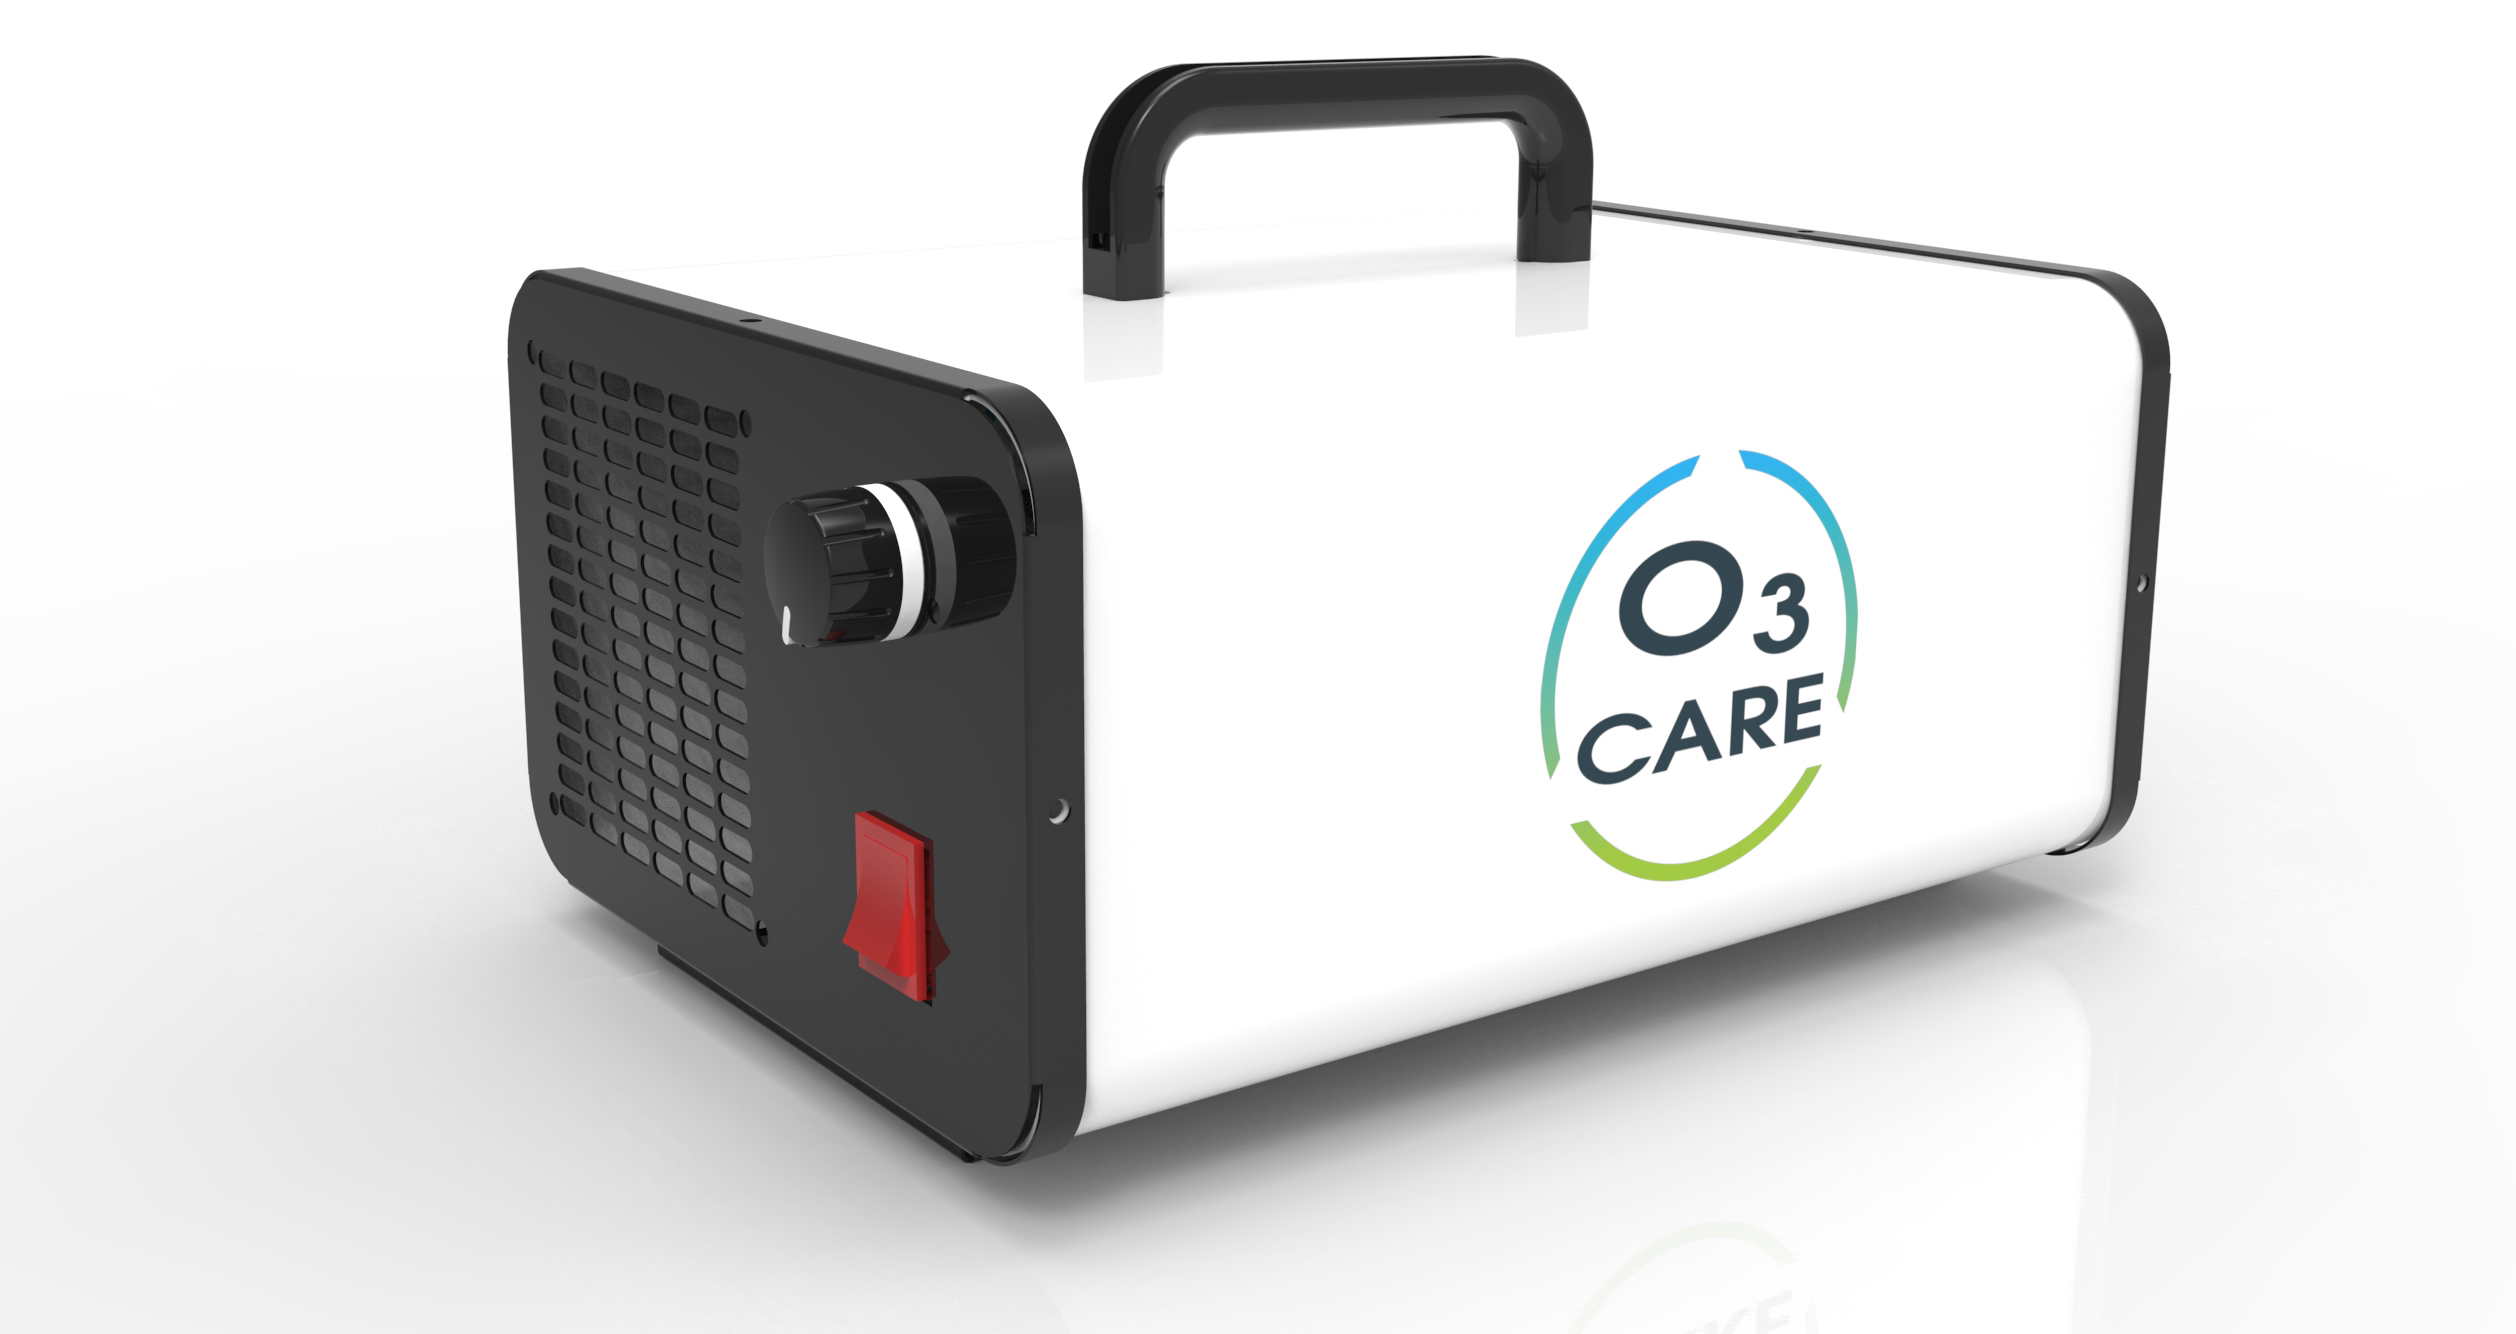 O3 Care generator